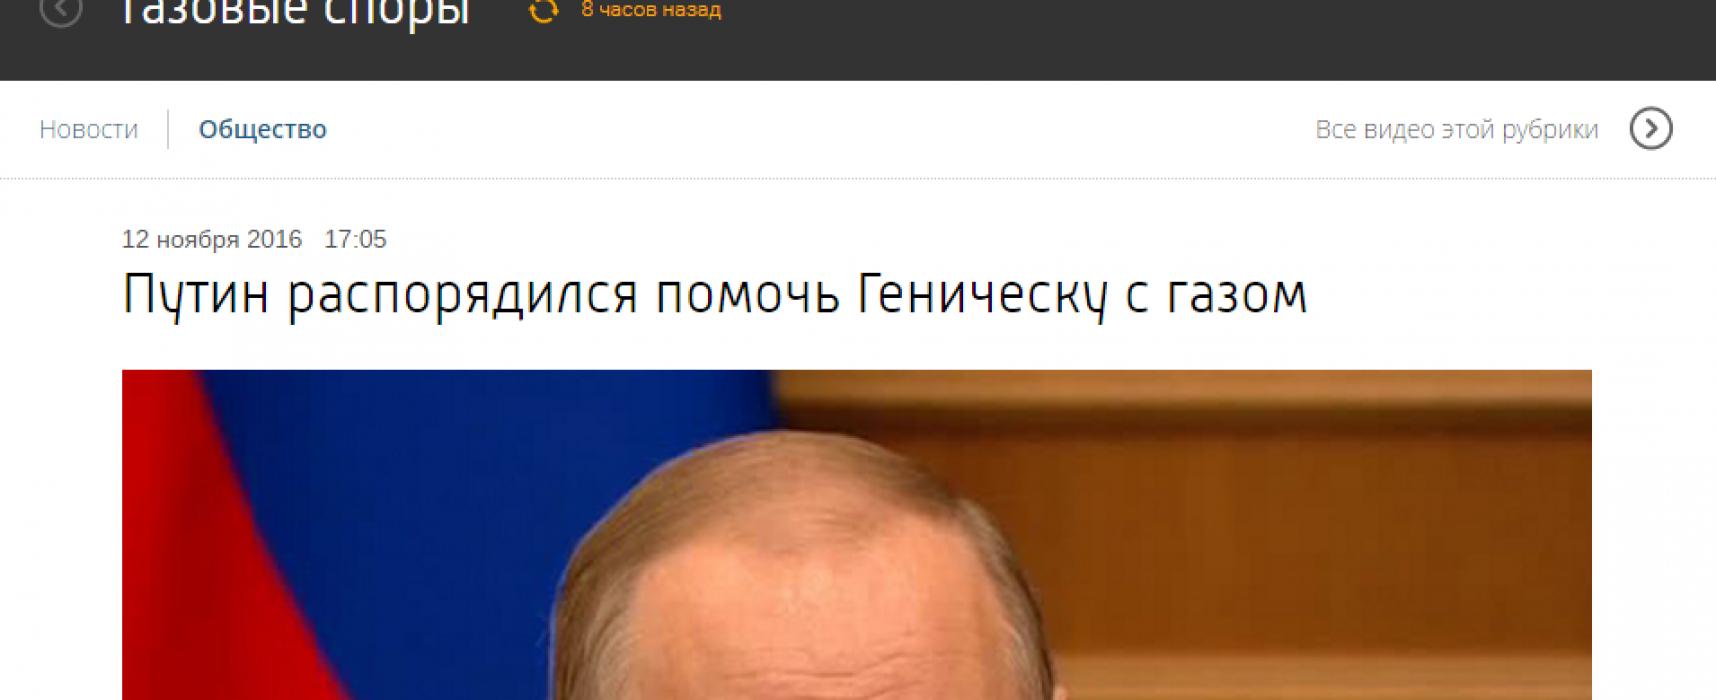 Ucraina : i residenti di Genichesk chiedono il gas a Putin (Fake)